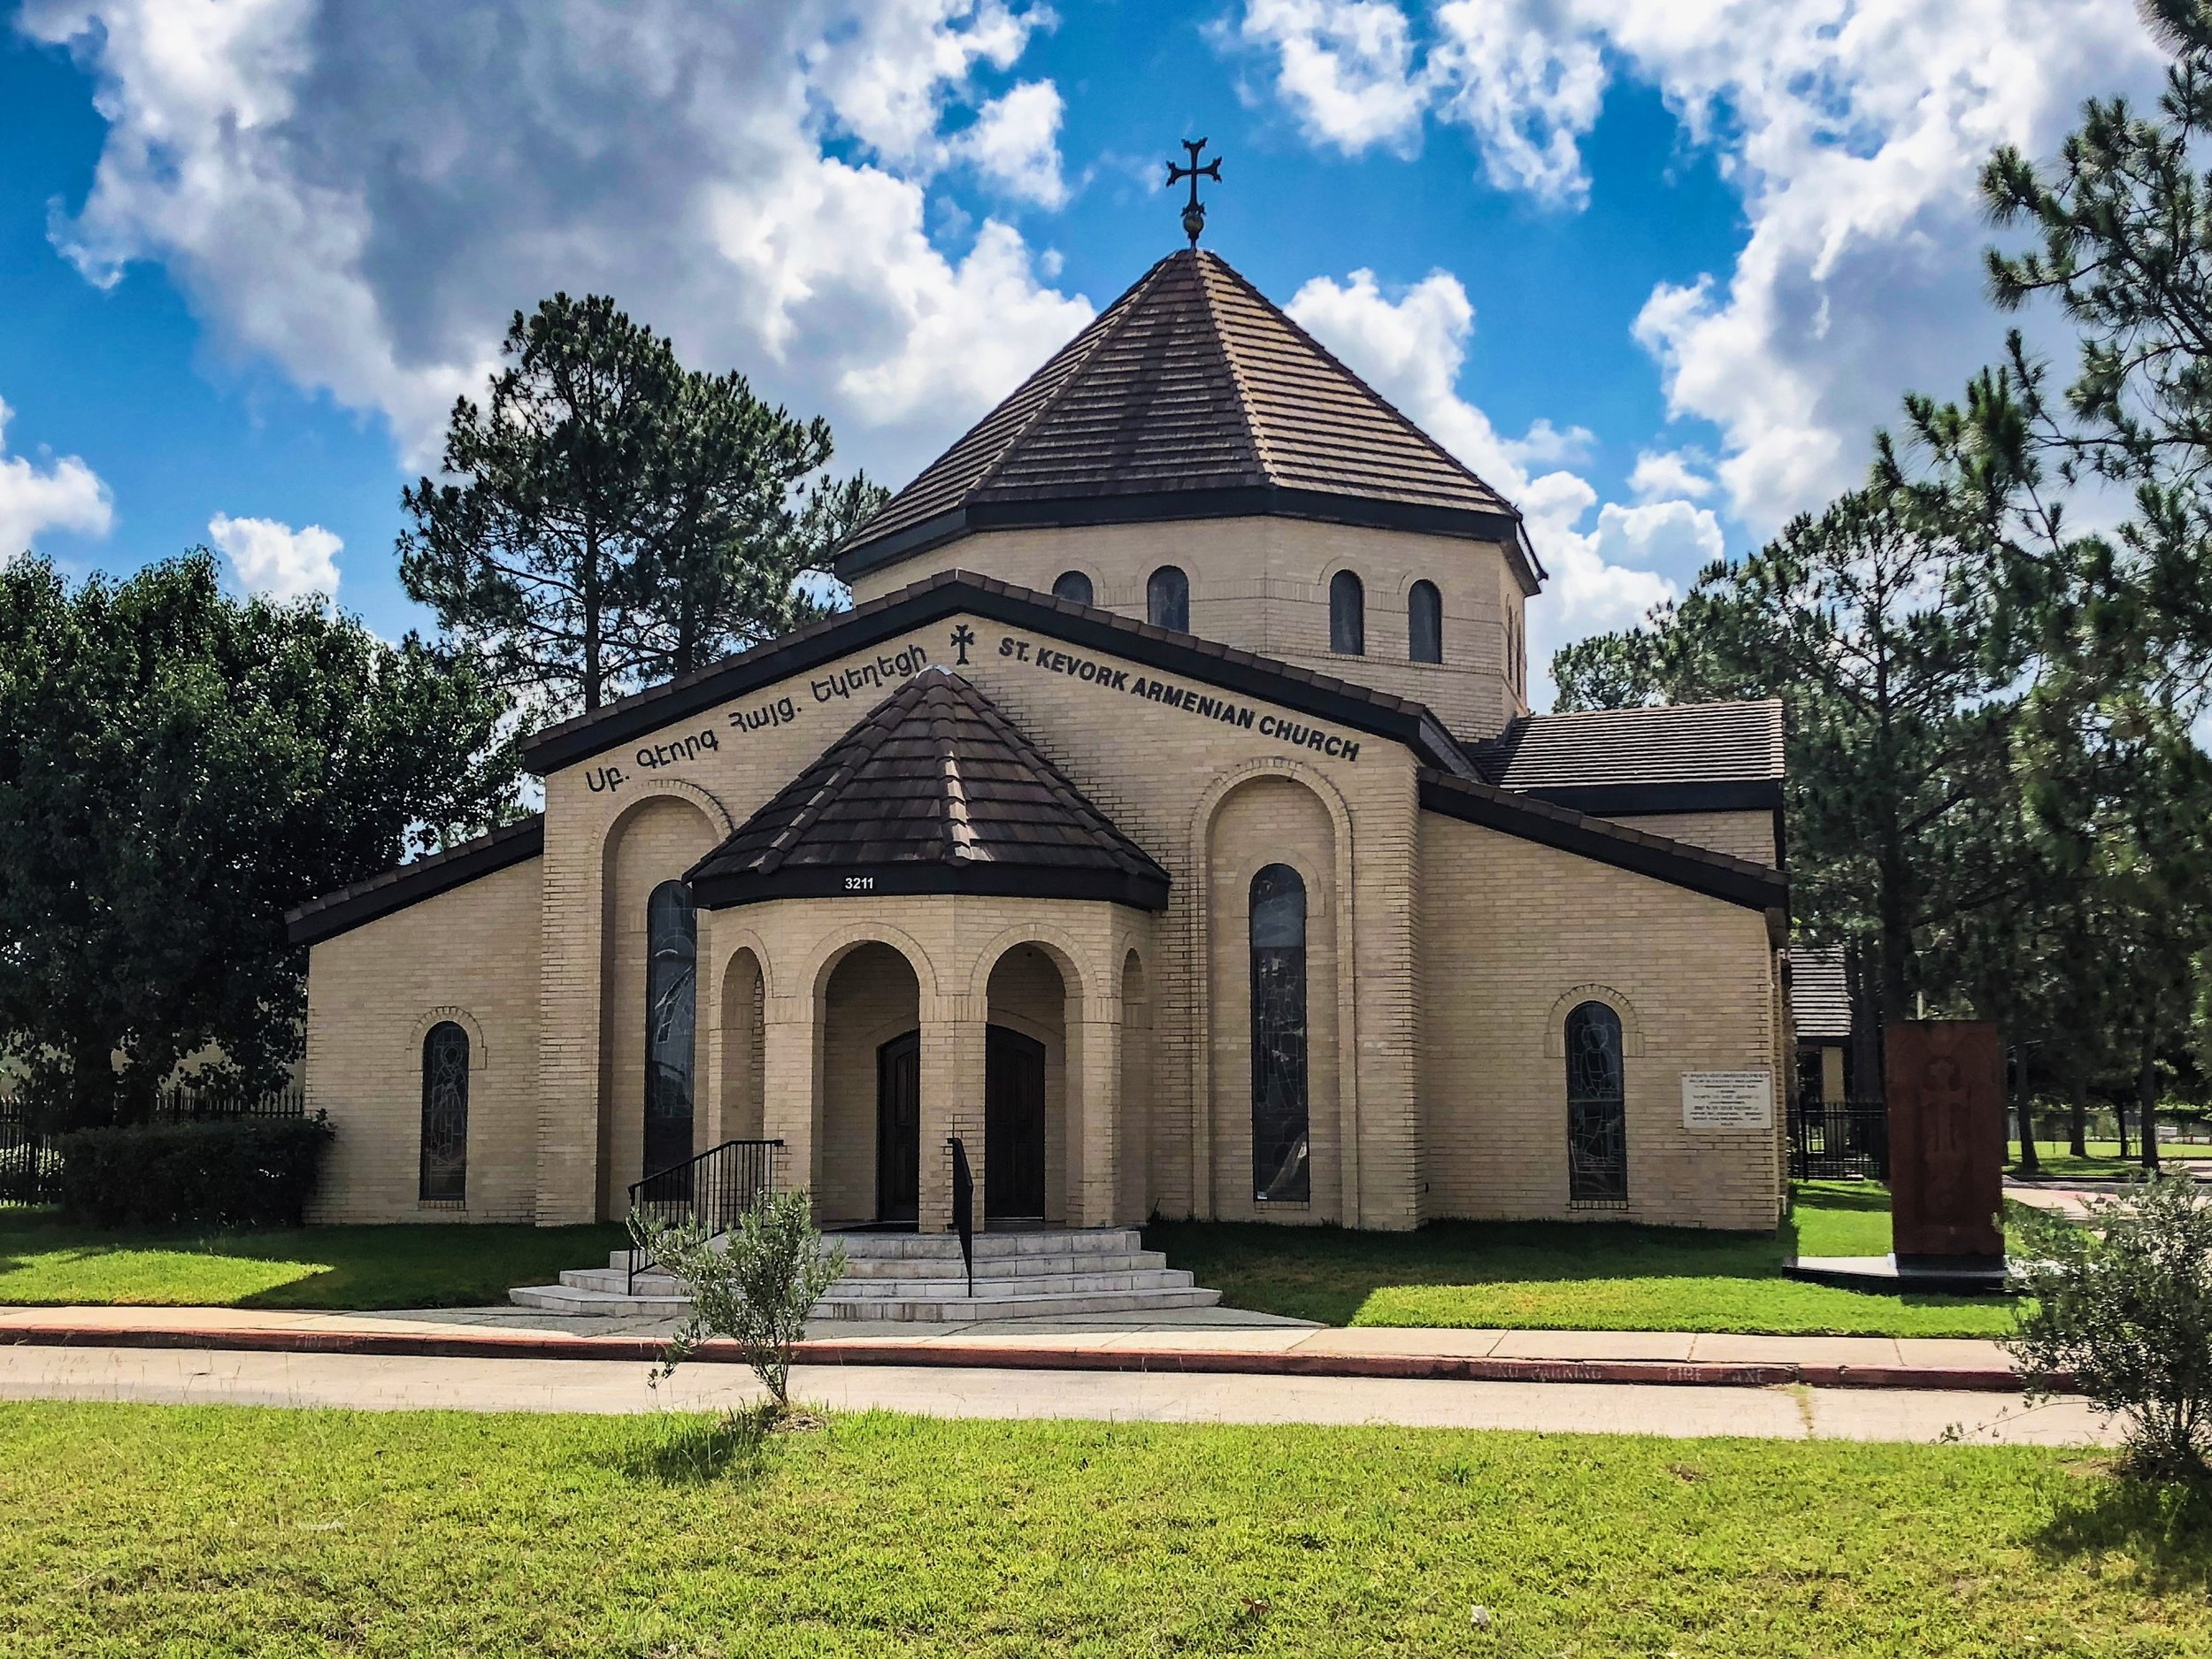 St. Kevork Armenian Apostolic Church in West Houston.